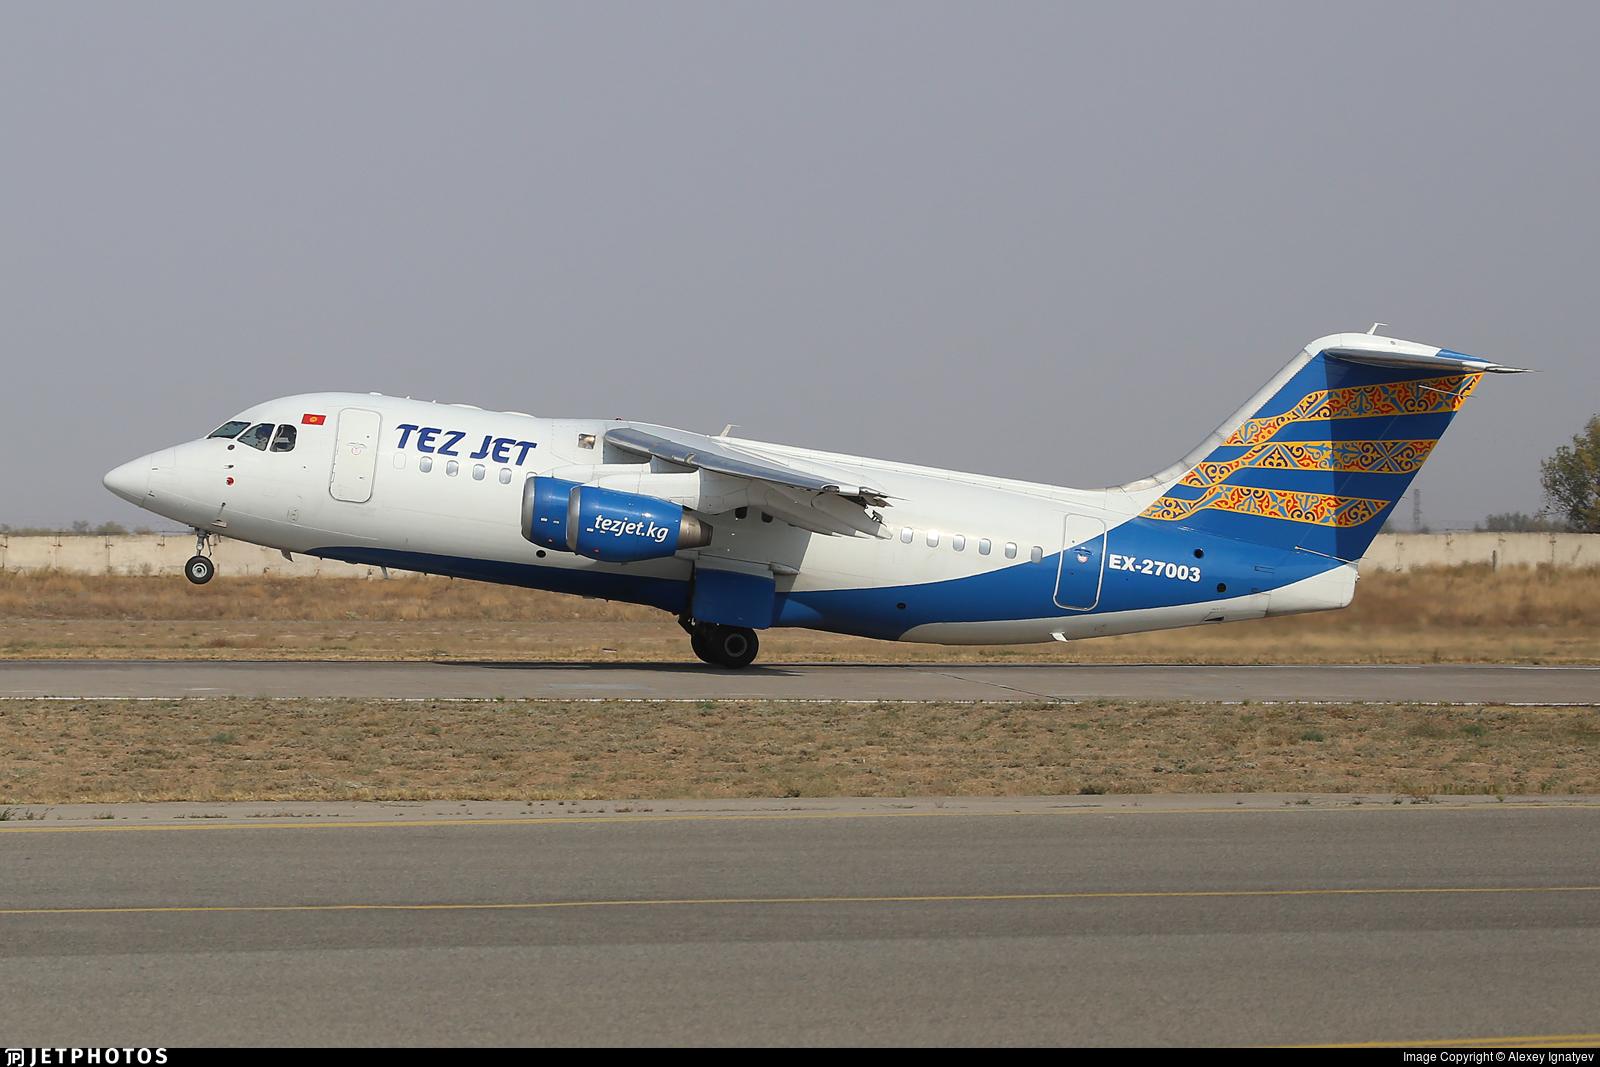 EX-27003 - British Aerospace BAe 146-200 - TezJet Air Company